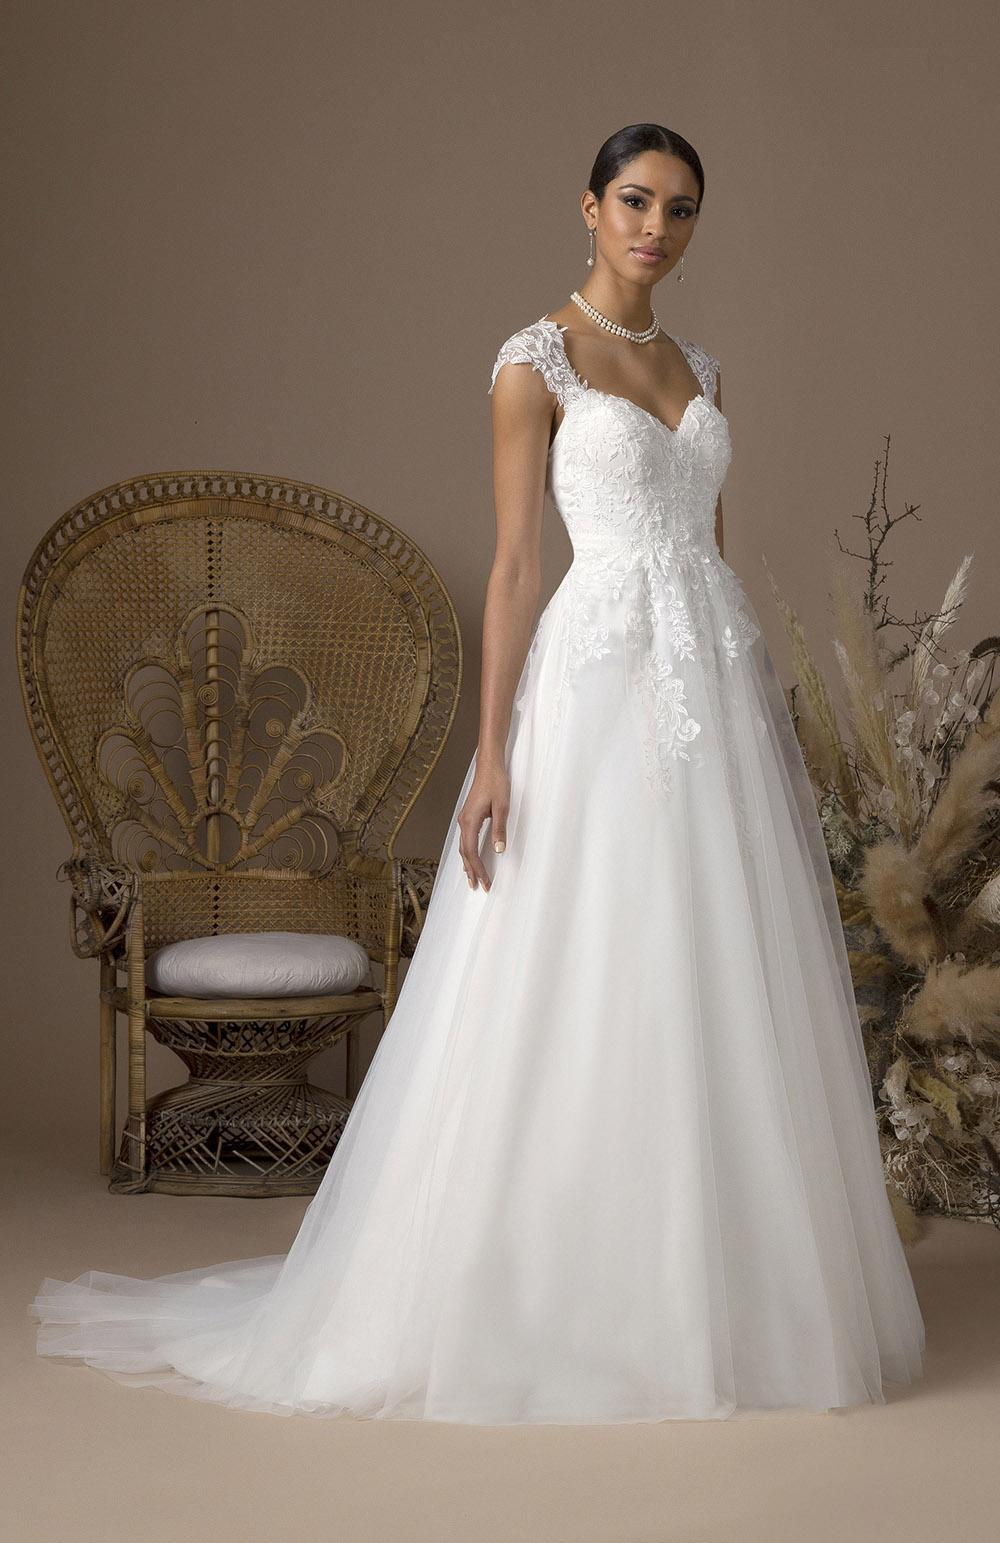 Robe de mariée Modèle Douka